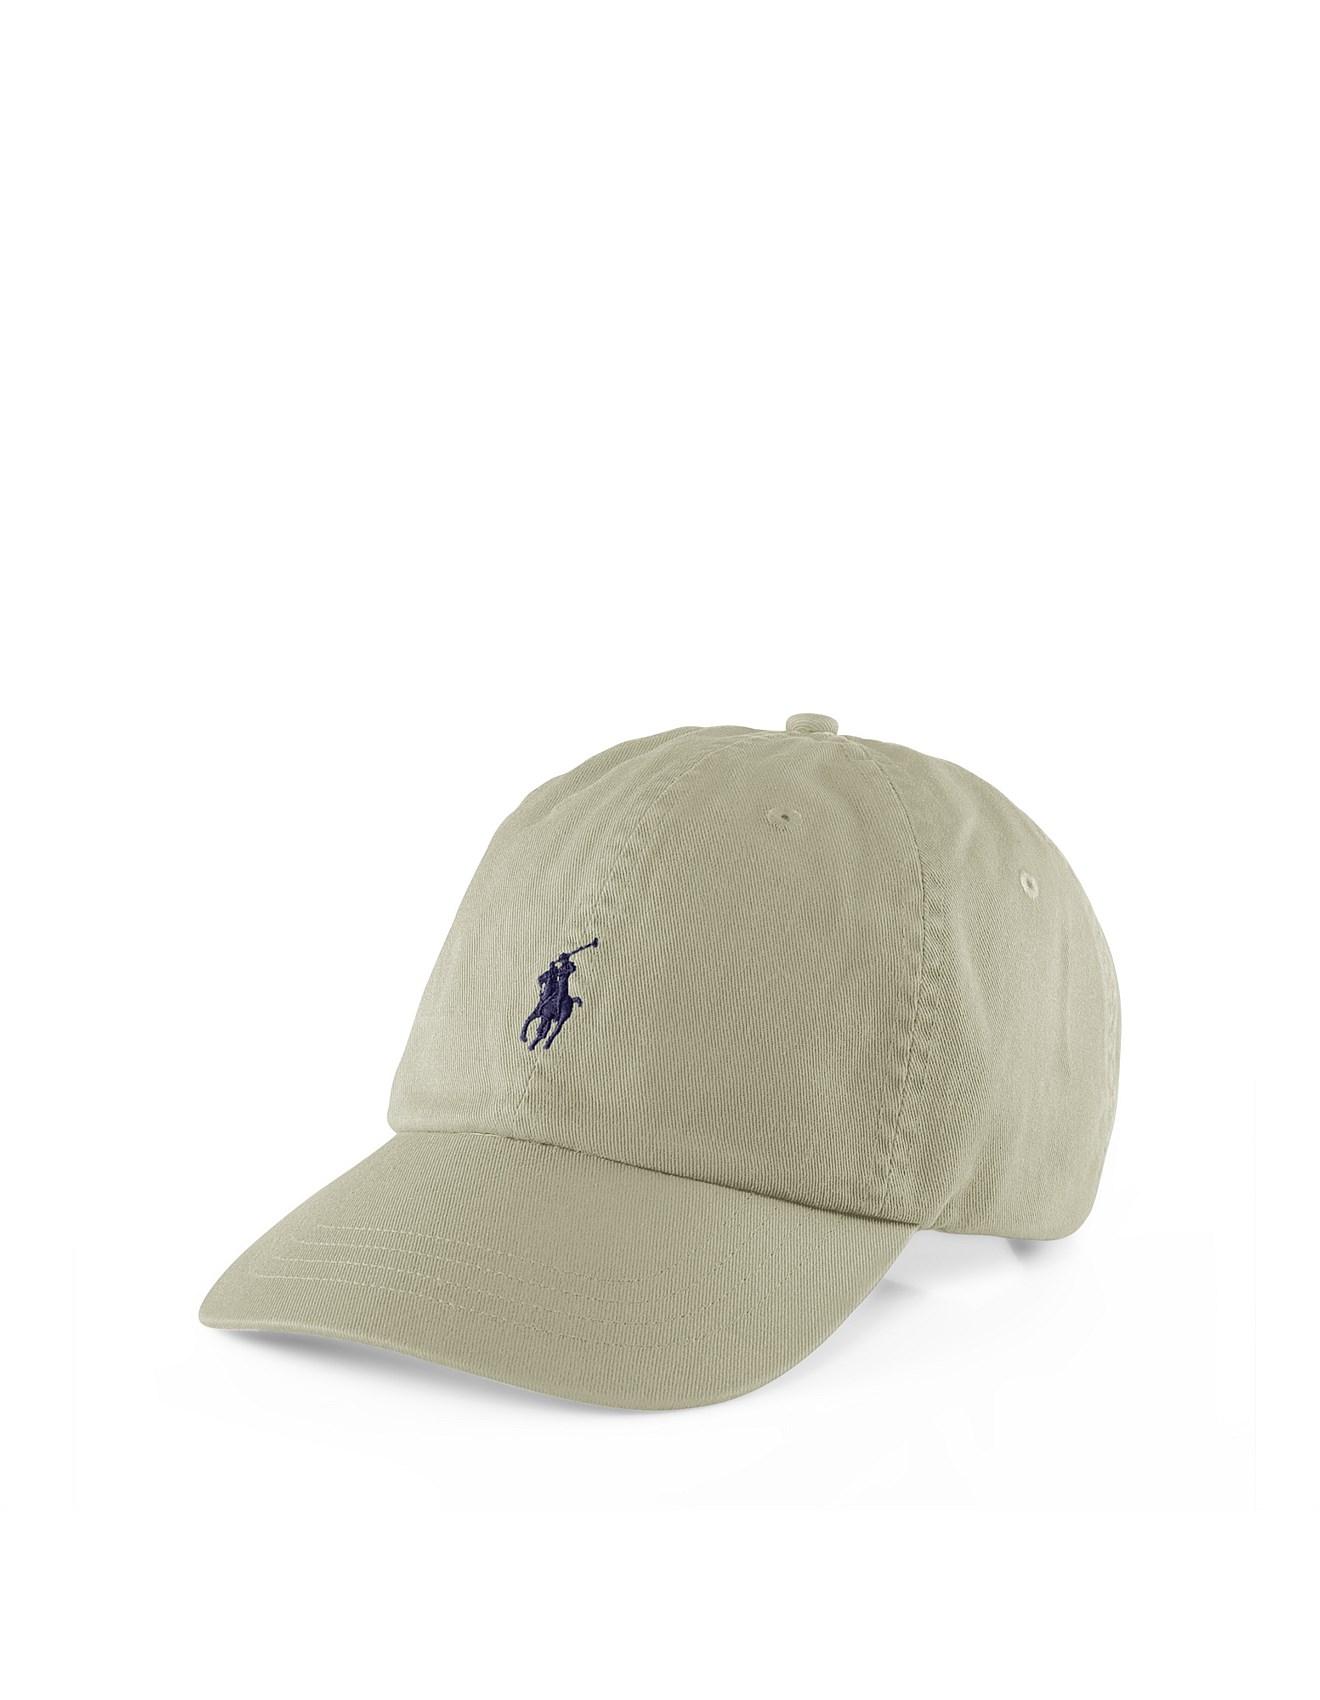 98930a88fd95b5 Mens Polo Chino Baseball Cap